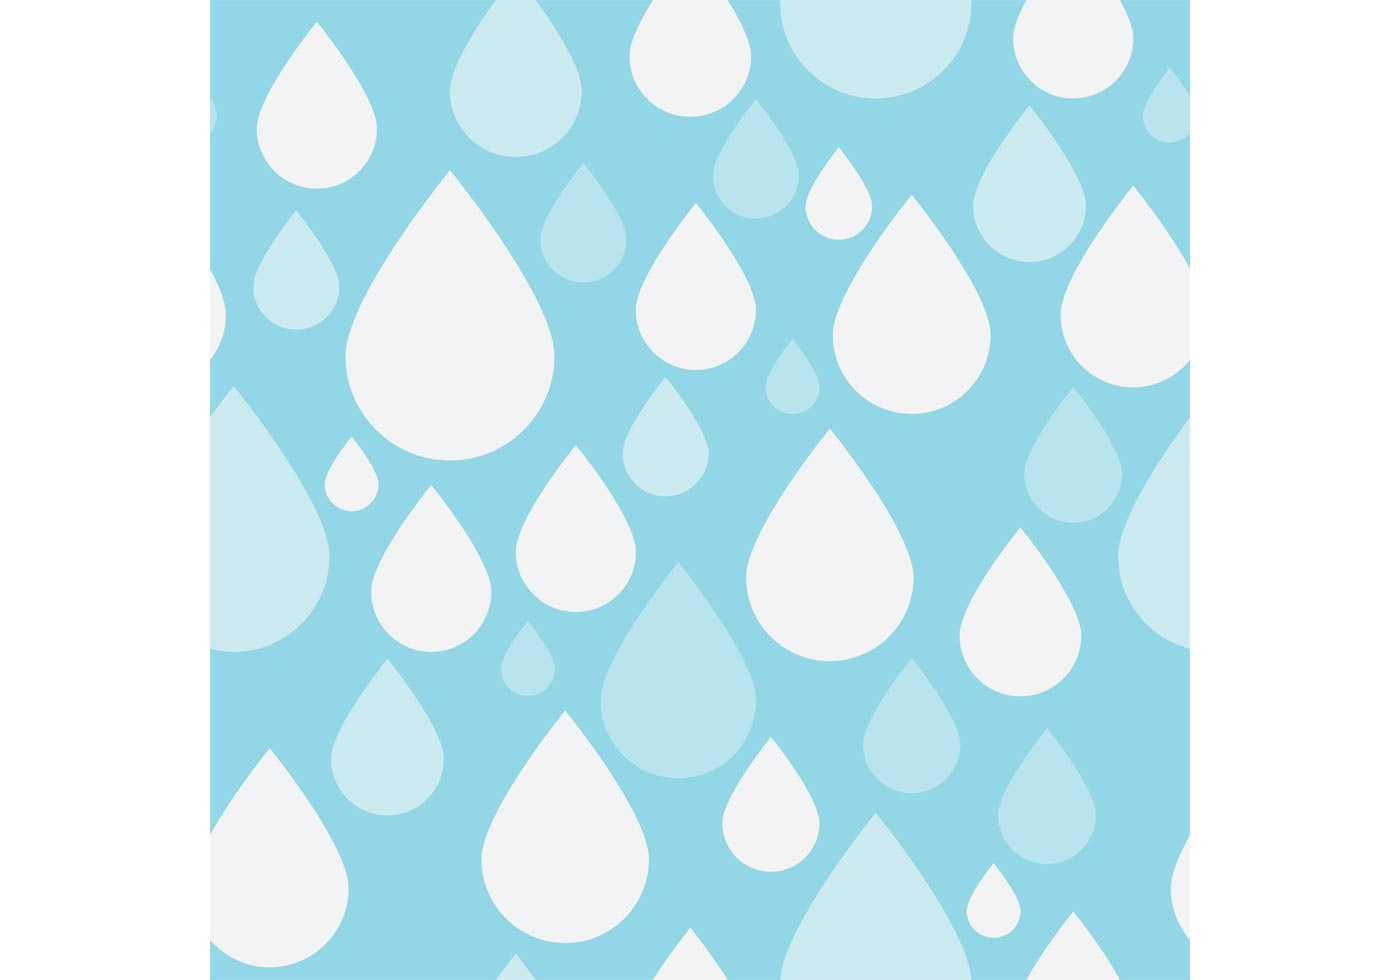 Black And White Polka Dot Wallpaper Border Pattern Vector Of Simple Rain Drops